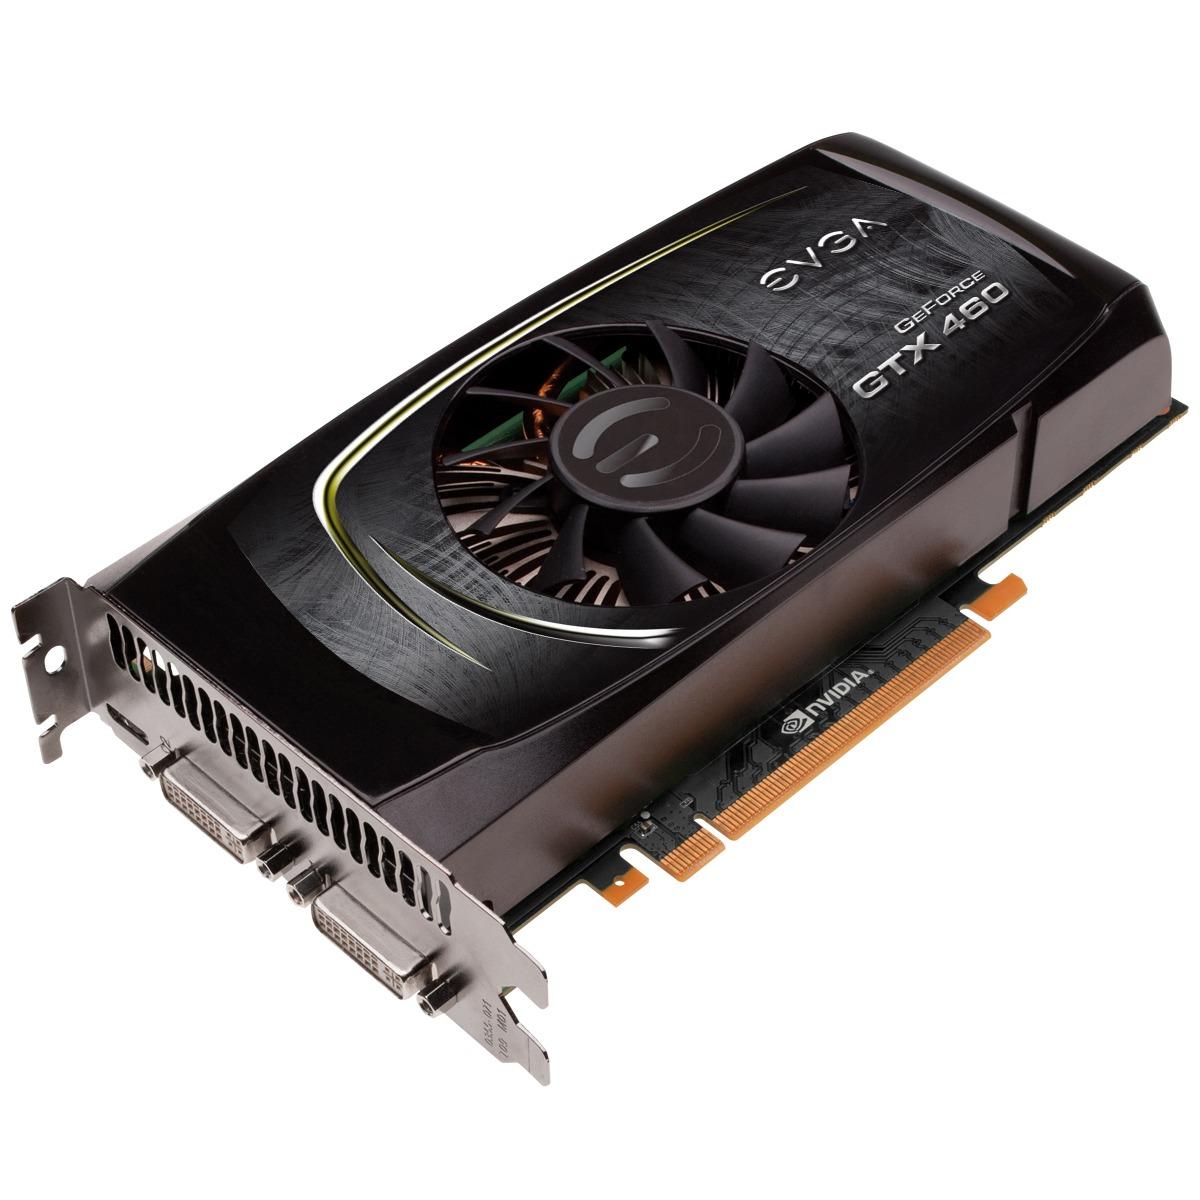 Carte graphique EVGA GeForce GTX 460 768 MB EVGA GeForce GTX 460 - 768 Mo Dual DVI/Mini HDMI - PCI-Express (NVIDIA GeForce avec CUDA GTX 460)